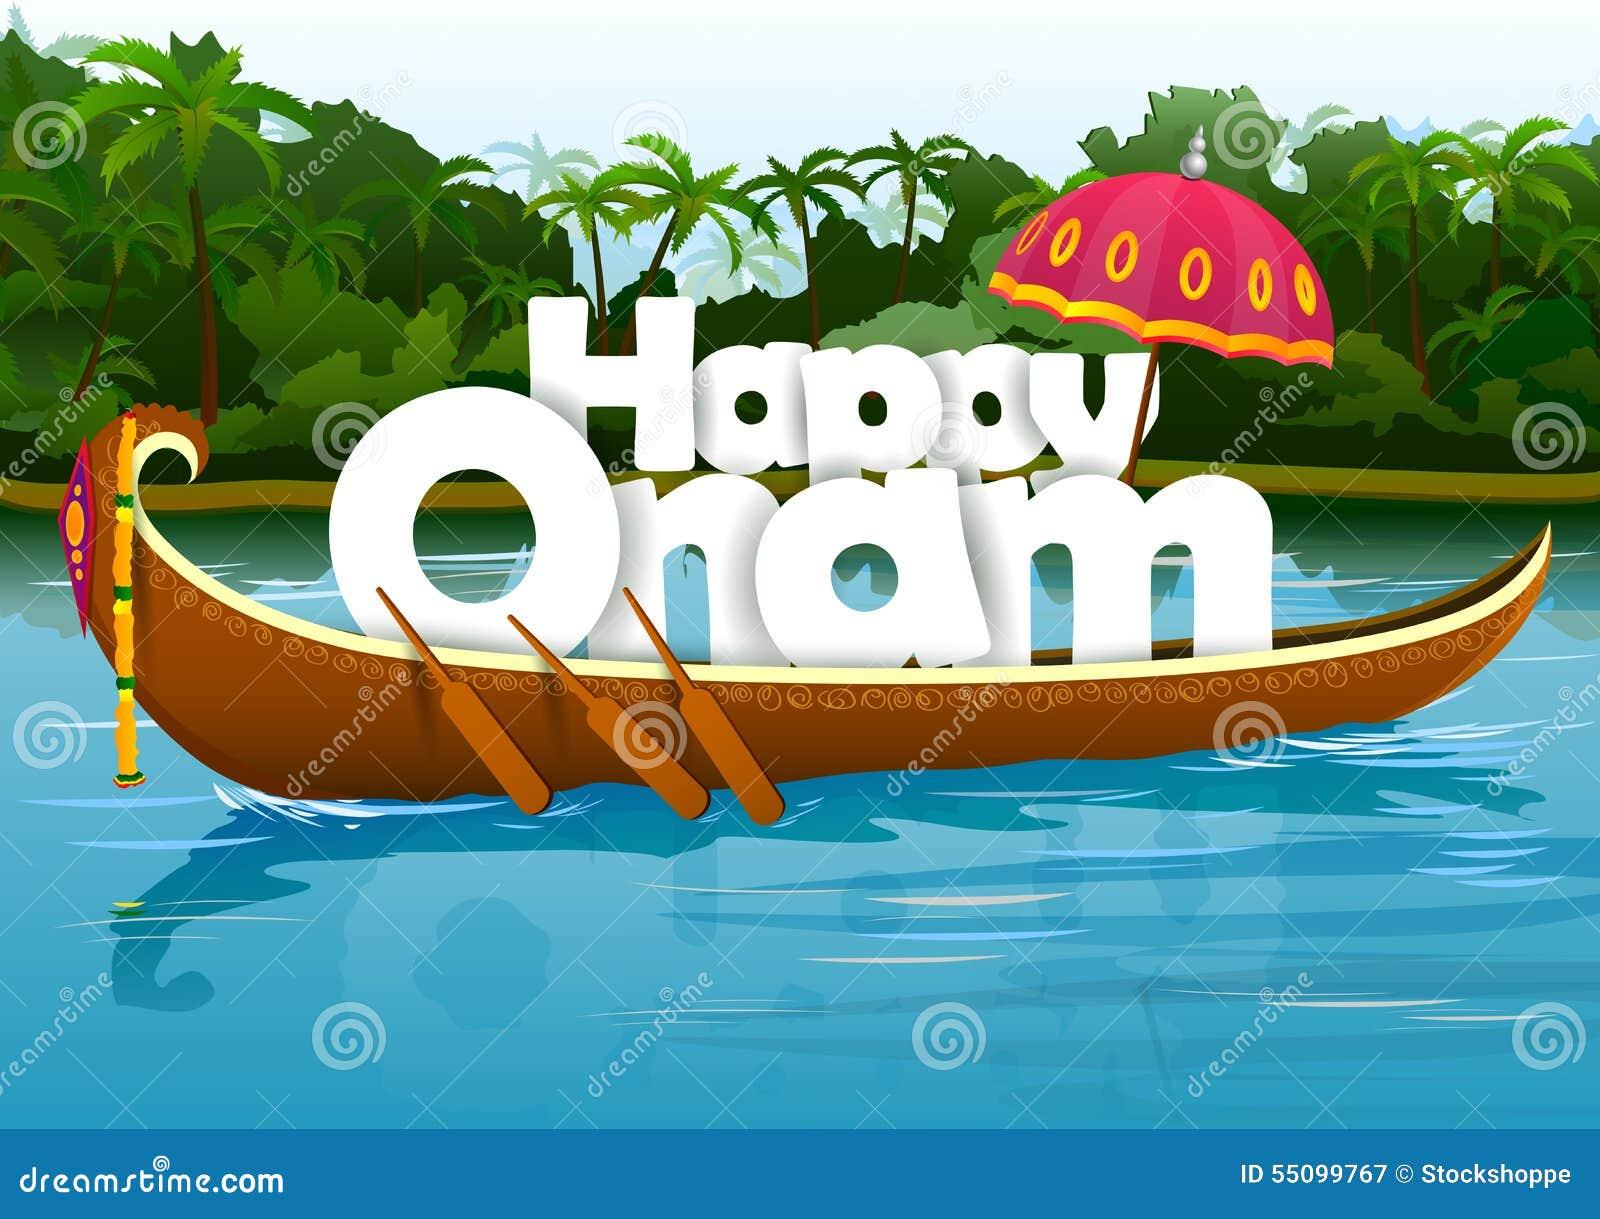 Happy onam wallpaper background stock vector illustration of asian happy onam wallpaper background kristyandbryce Image collections